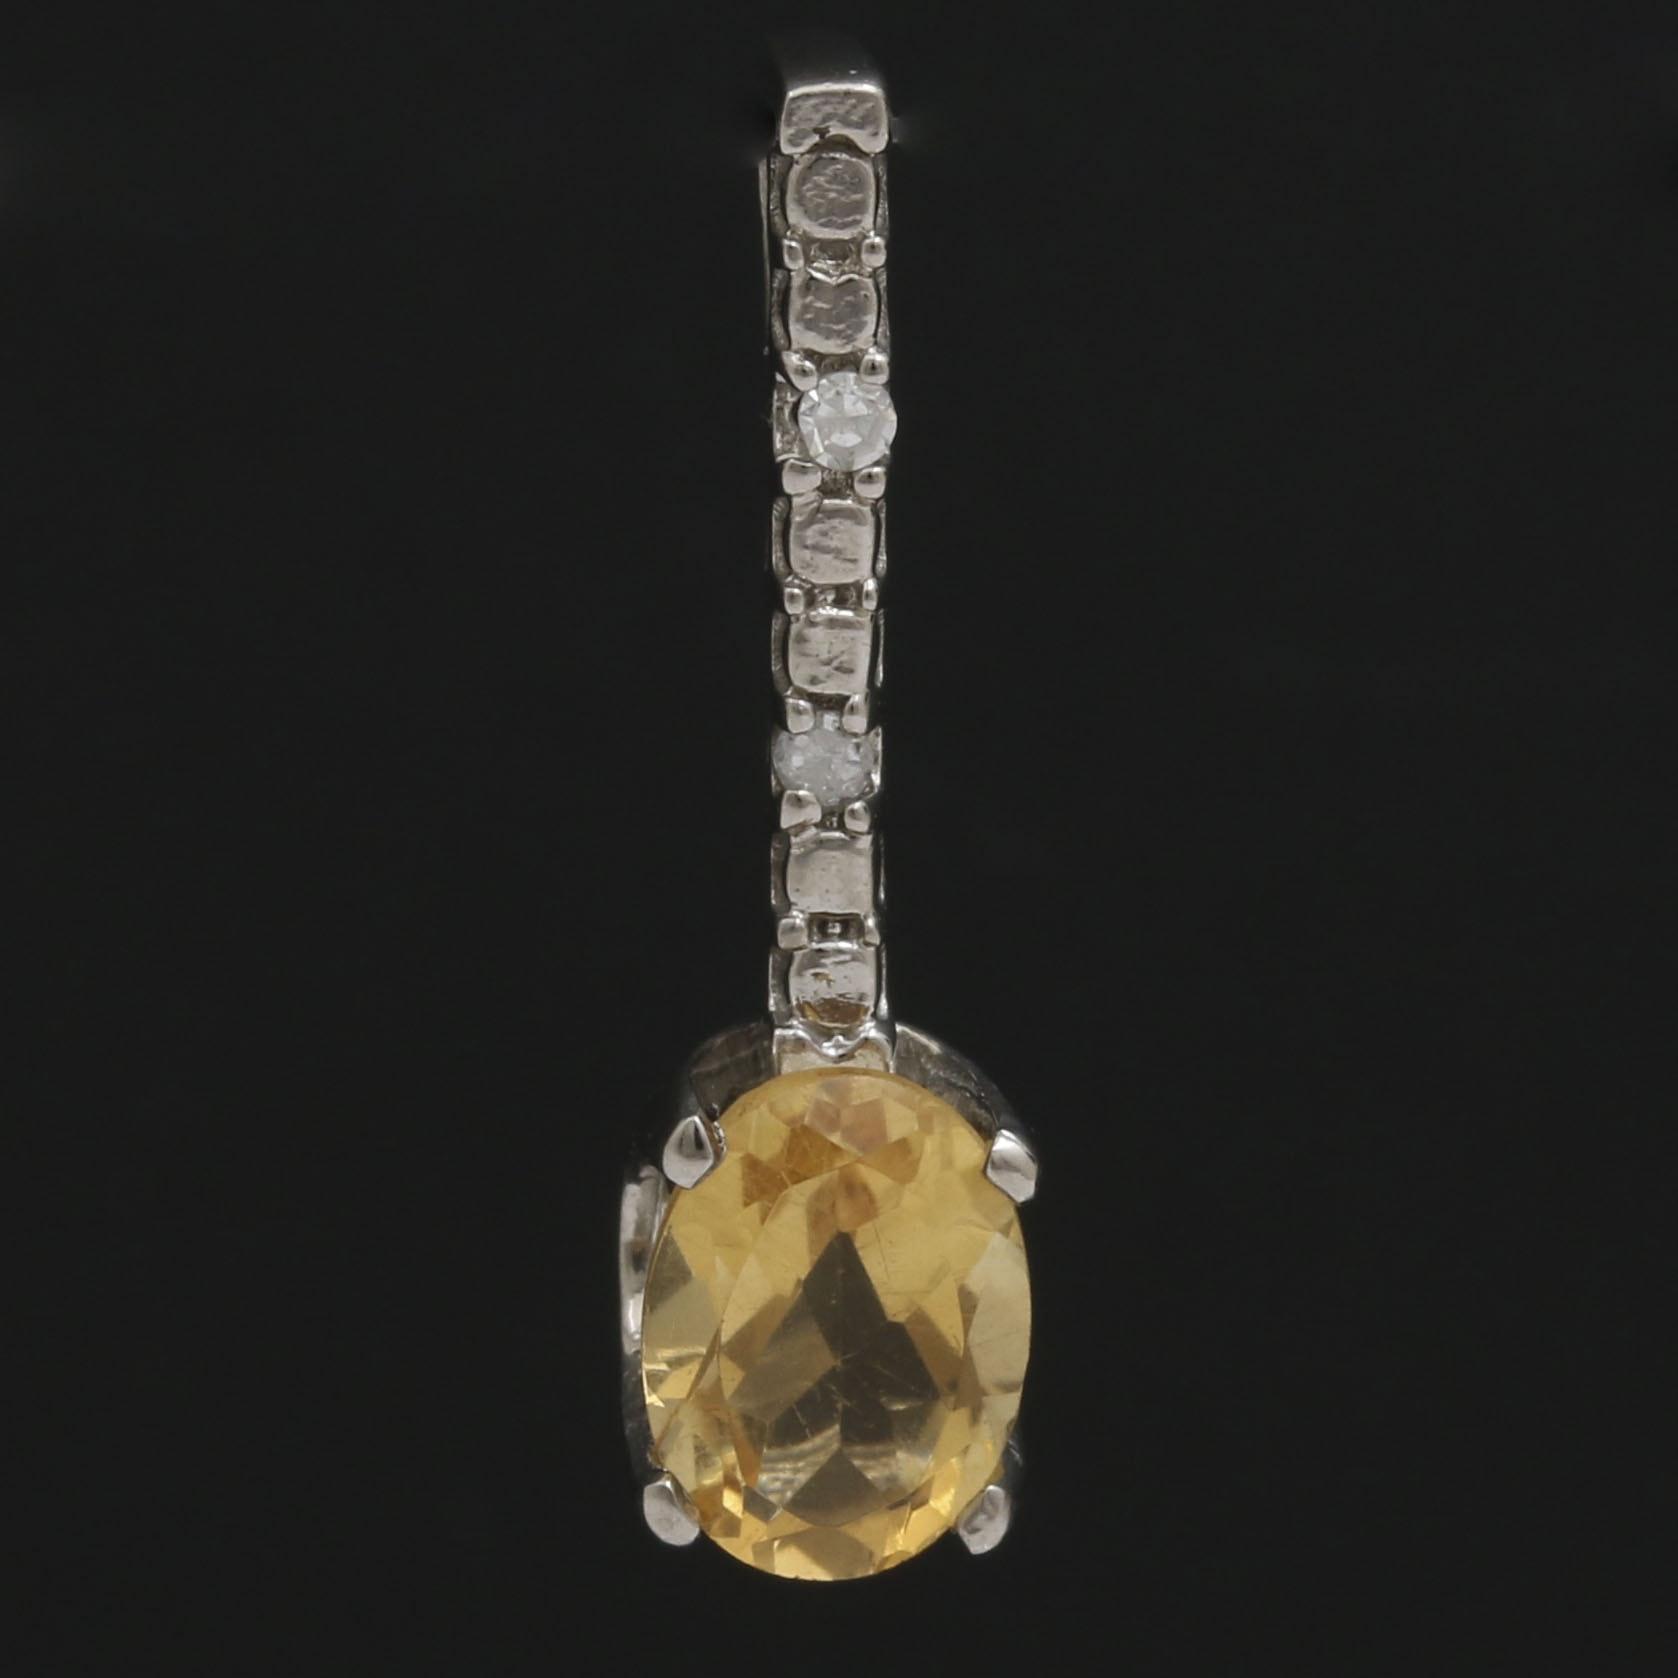 10K White Gold Citrine and Diamond Pendant